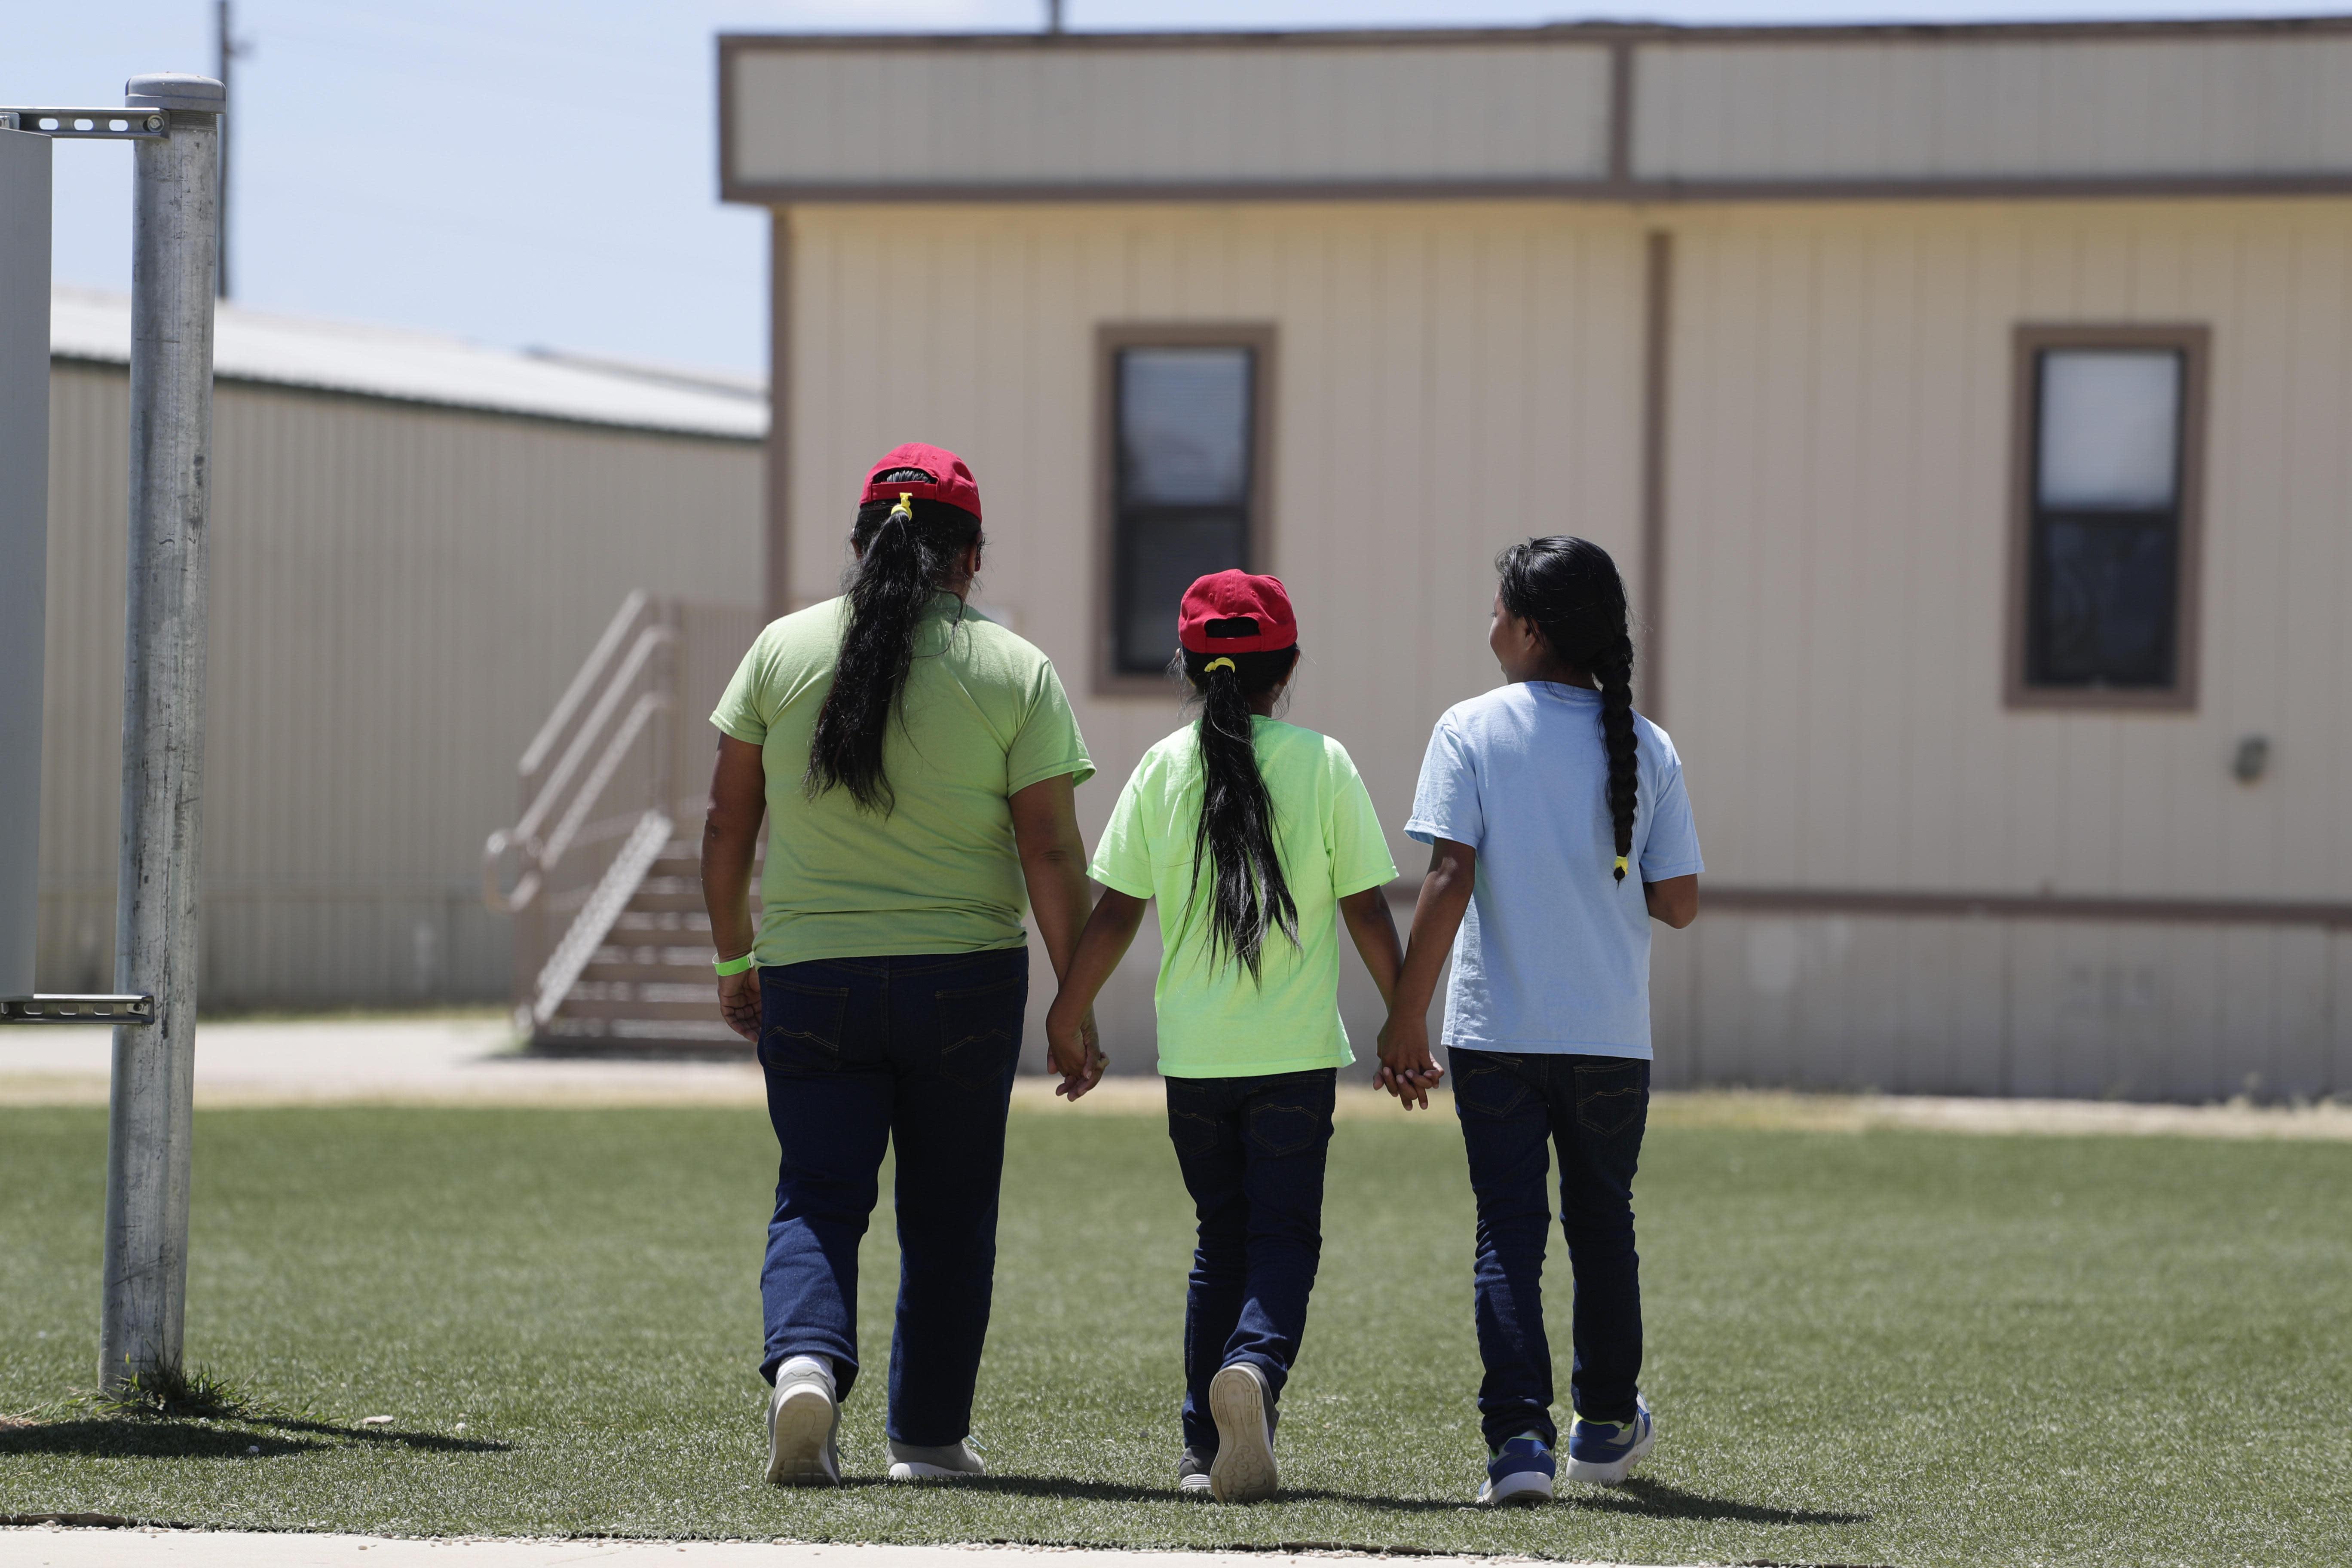 Judge orders release of migrant children, citing coronavirus